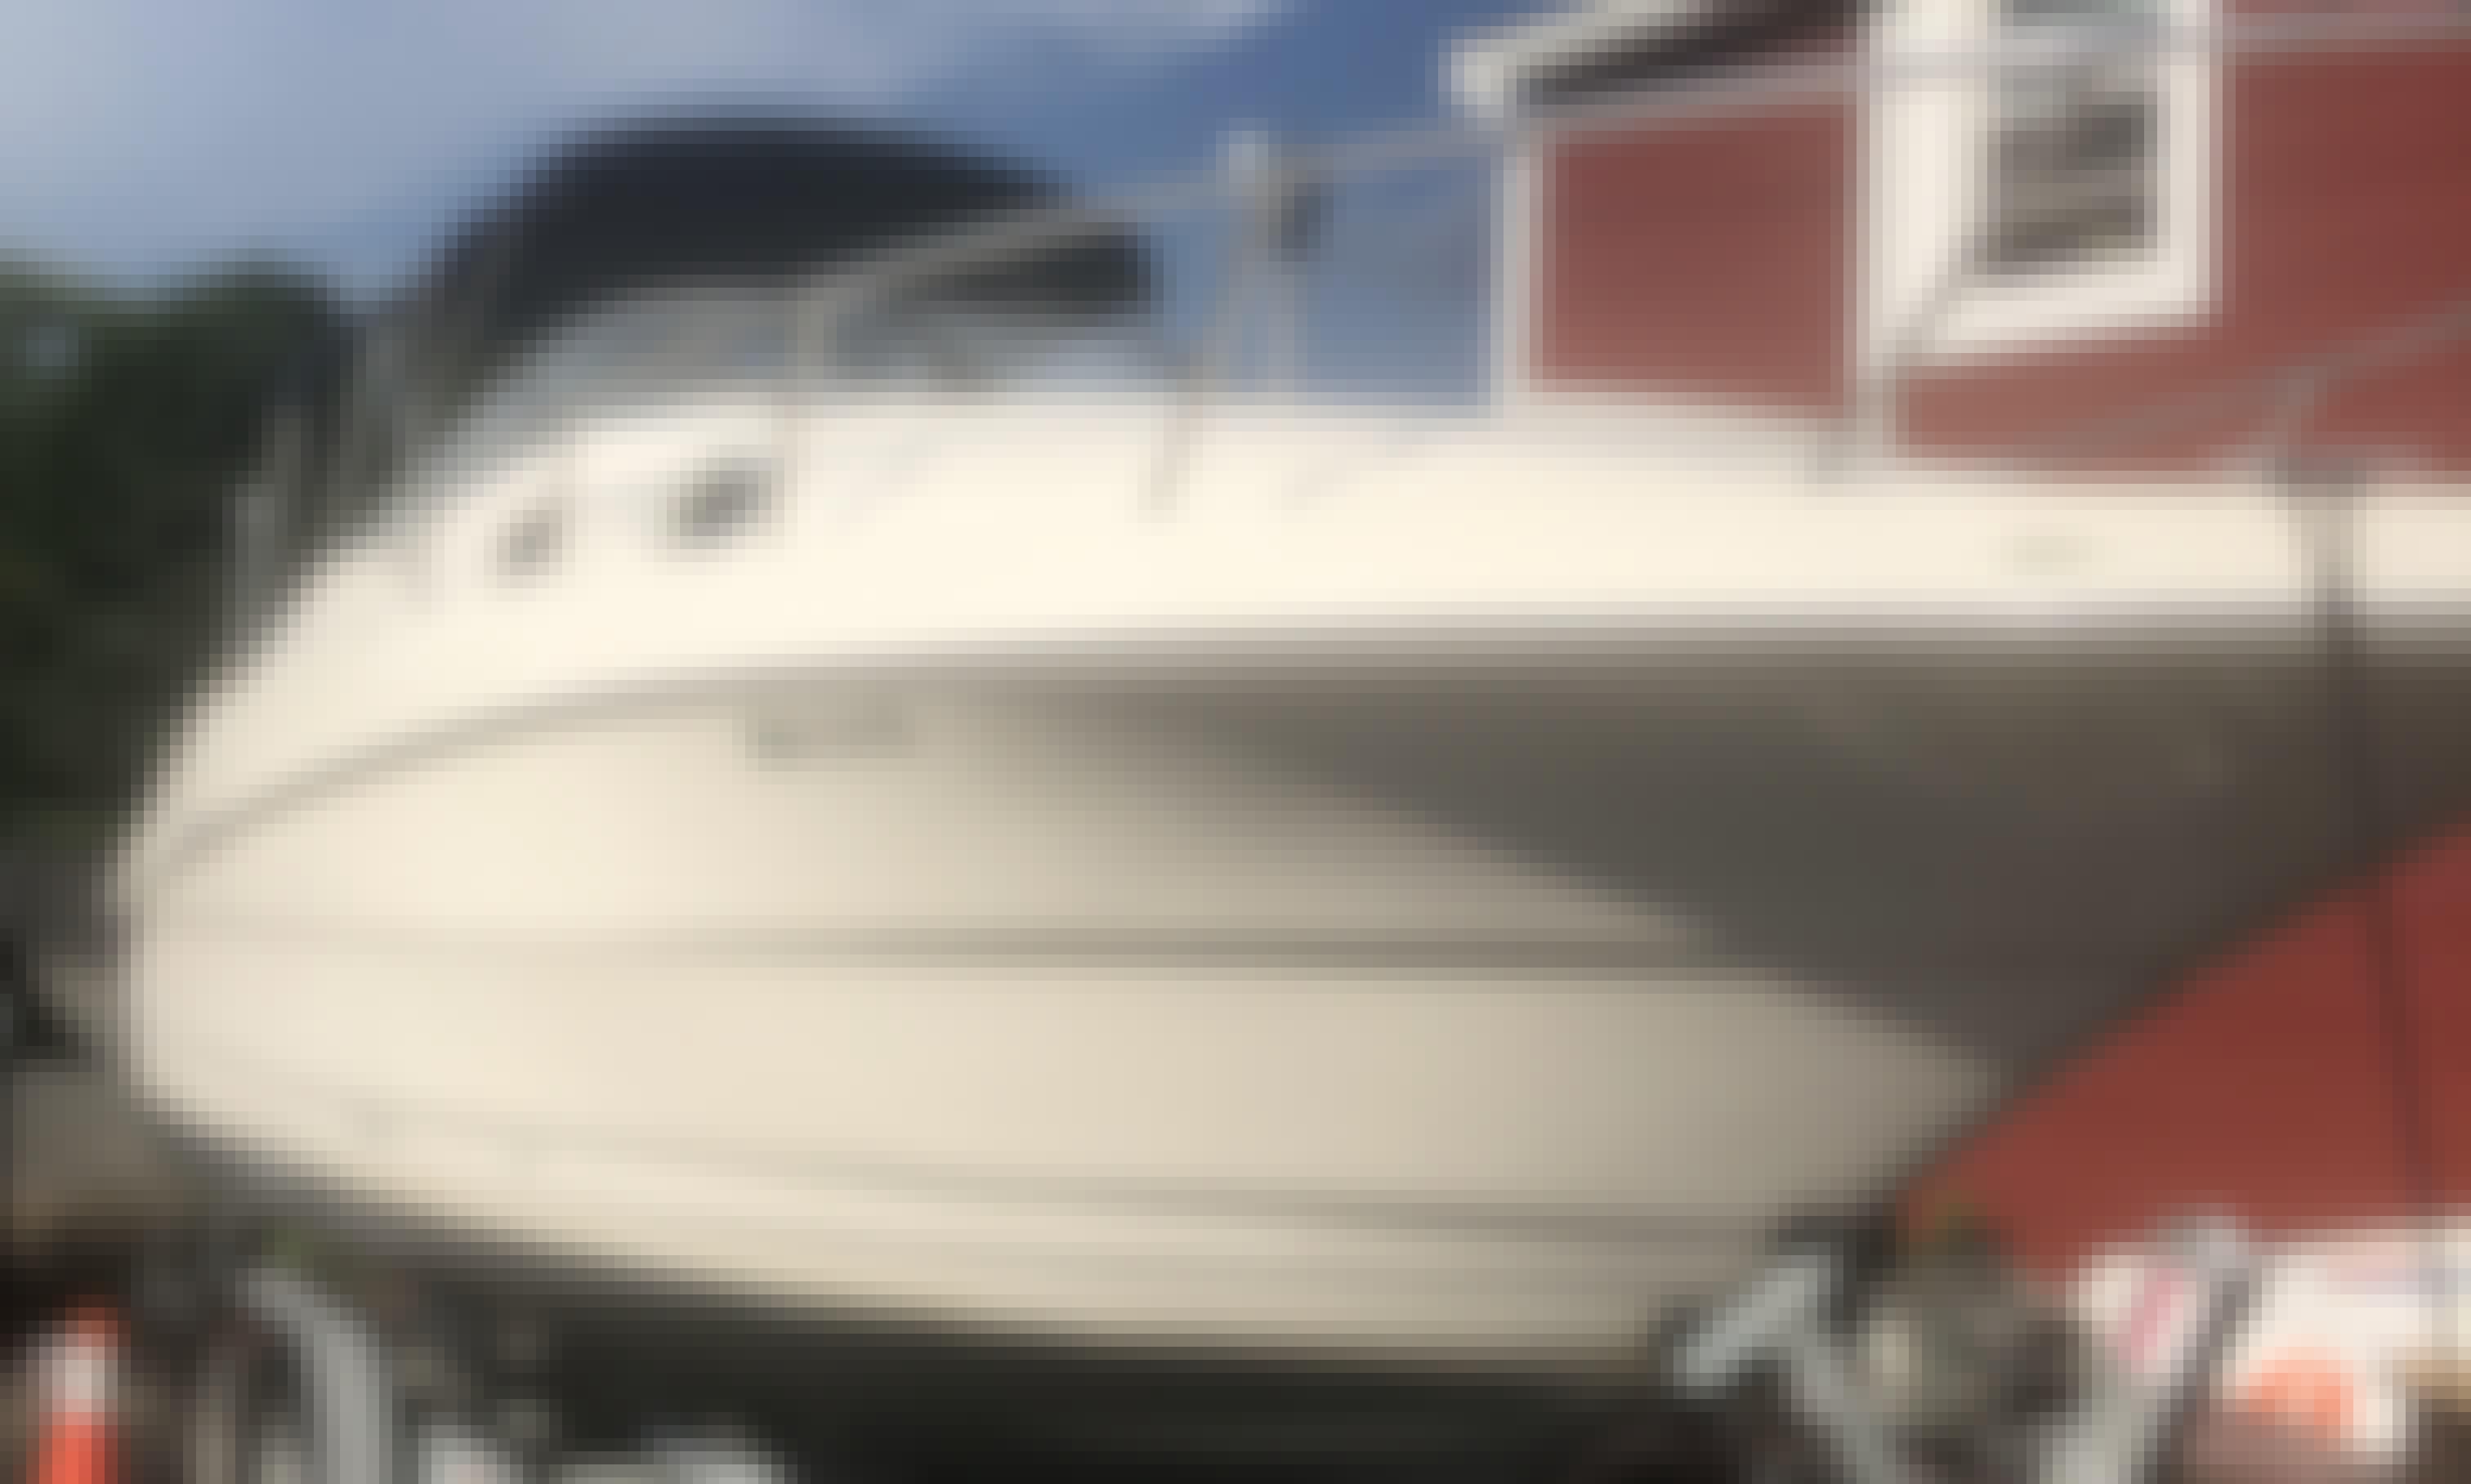 Monterery 262 Cruiser Rental in Saugus, MA